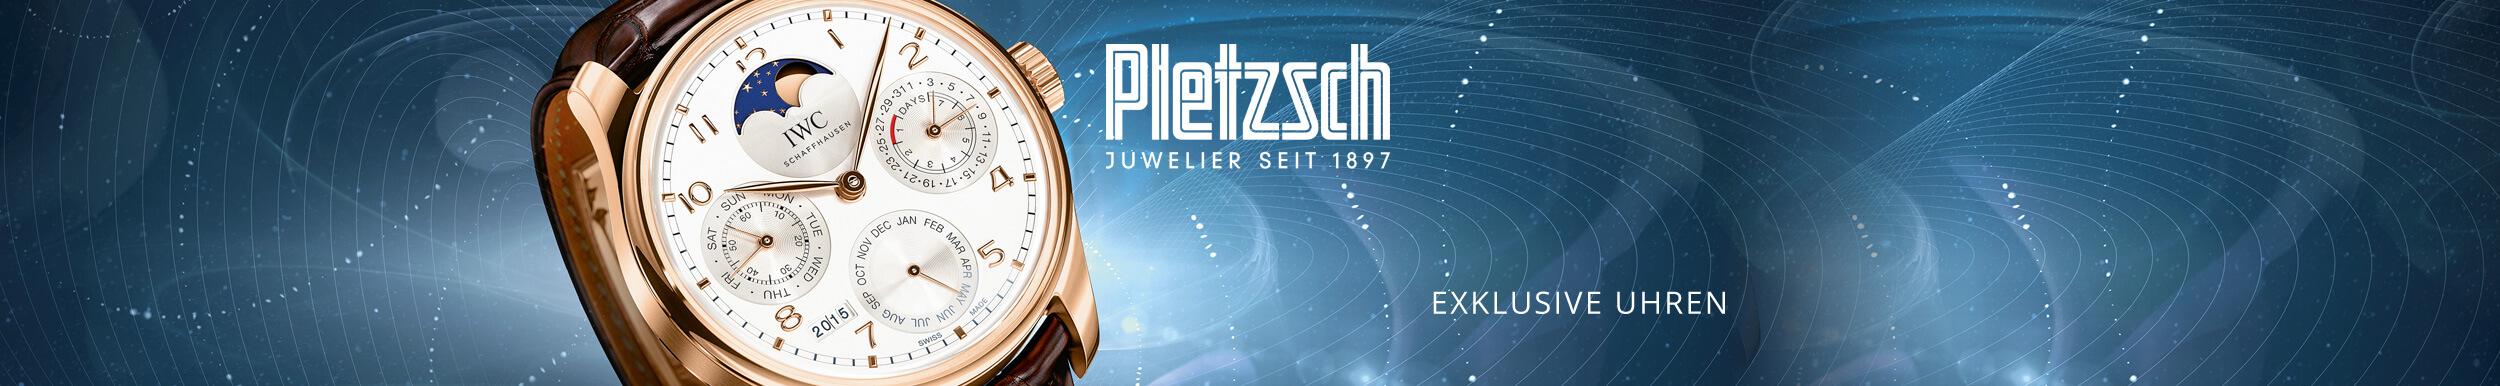 Juwelier Pletzsch kommt nach Karlsruhe